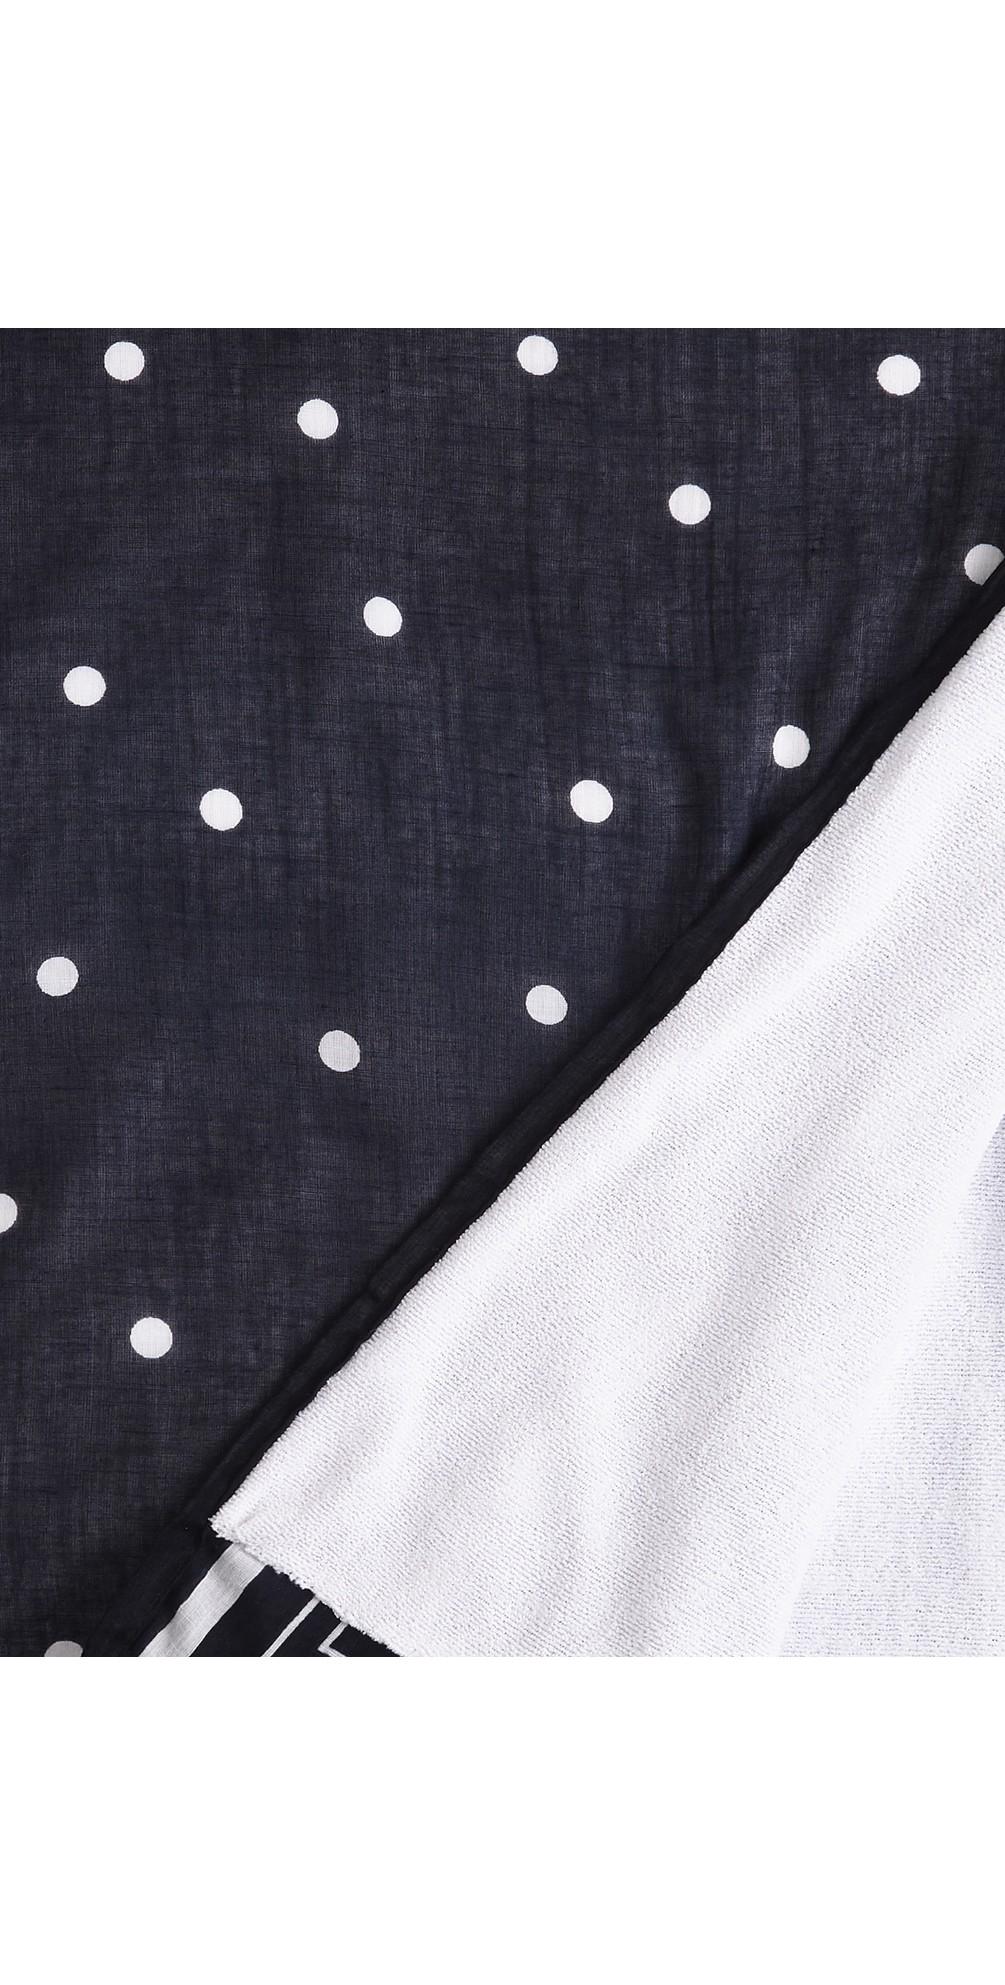 Stripe Spot Print Towel main image